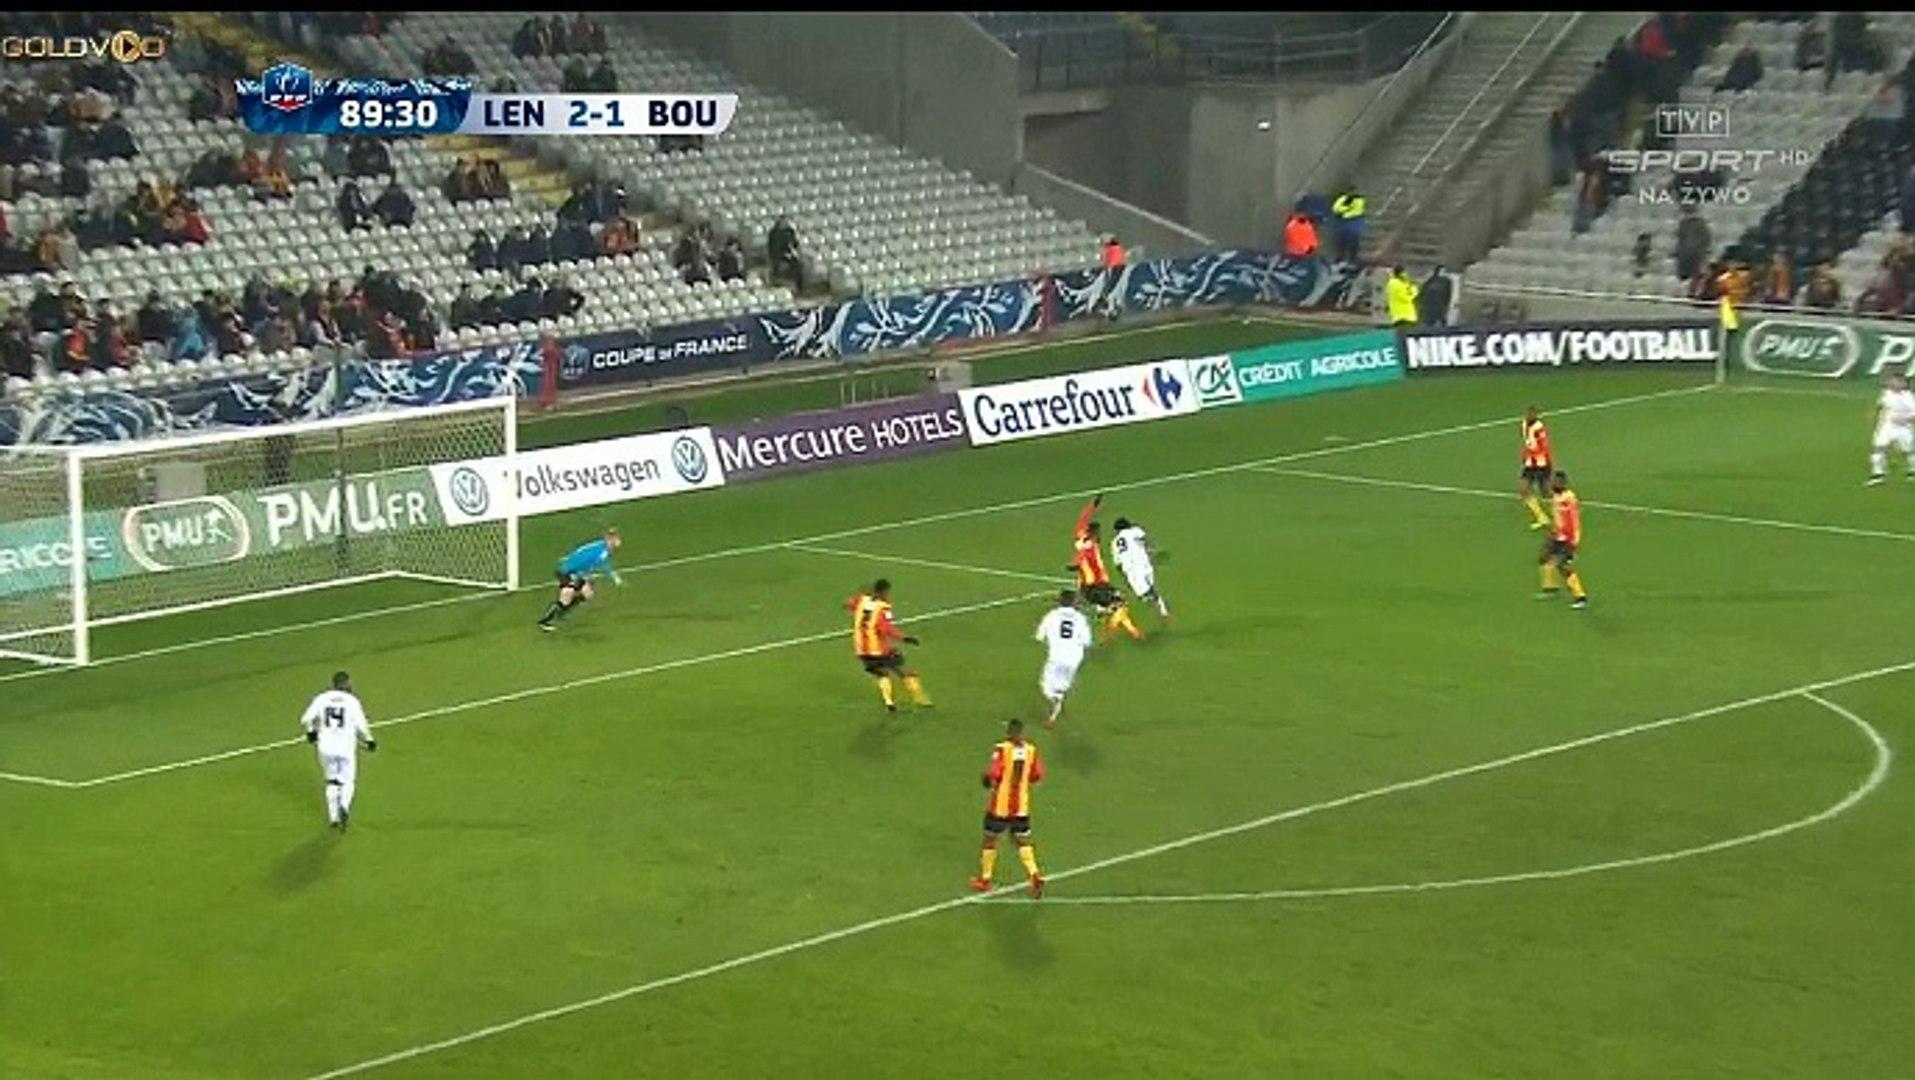 Koro Kone 2 Nd Goal Hd Lens 2 2 Boulogne 08012018